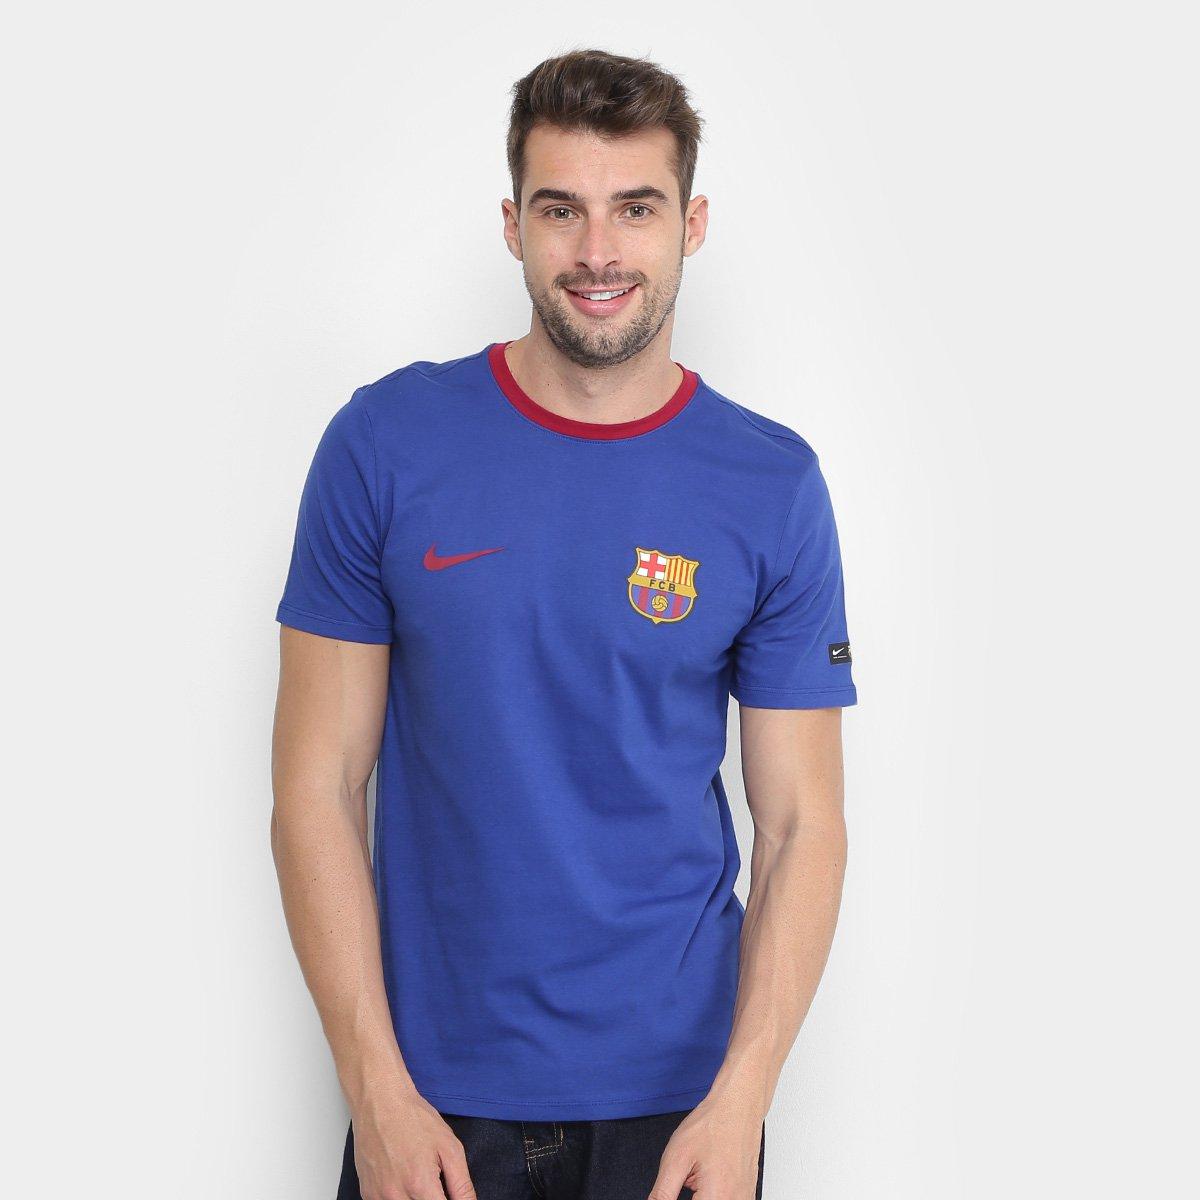 Camiseta Barcelona Crest Nike Masculina - Compre Agora  3c4e9be418ead